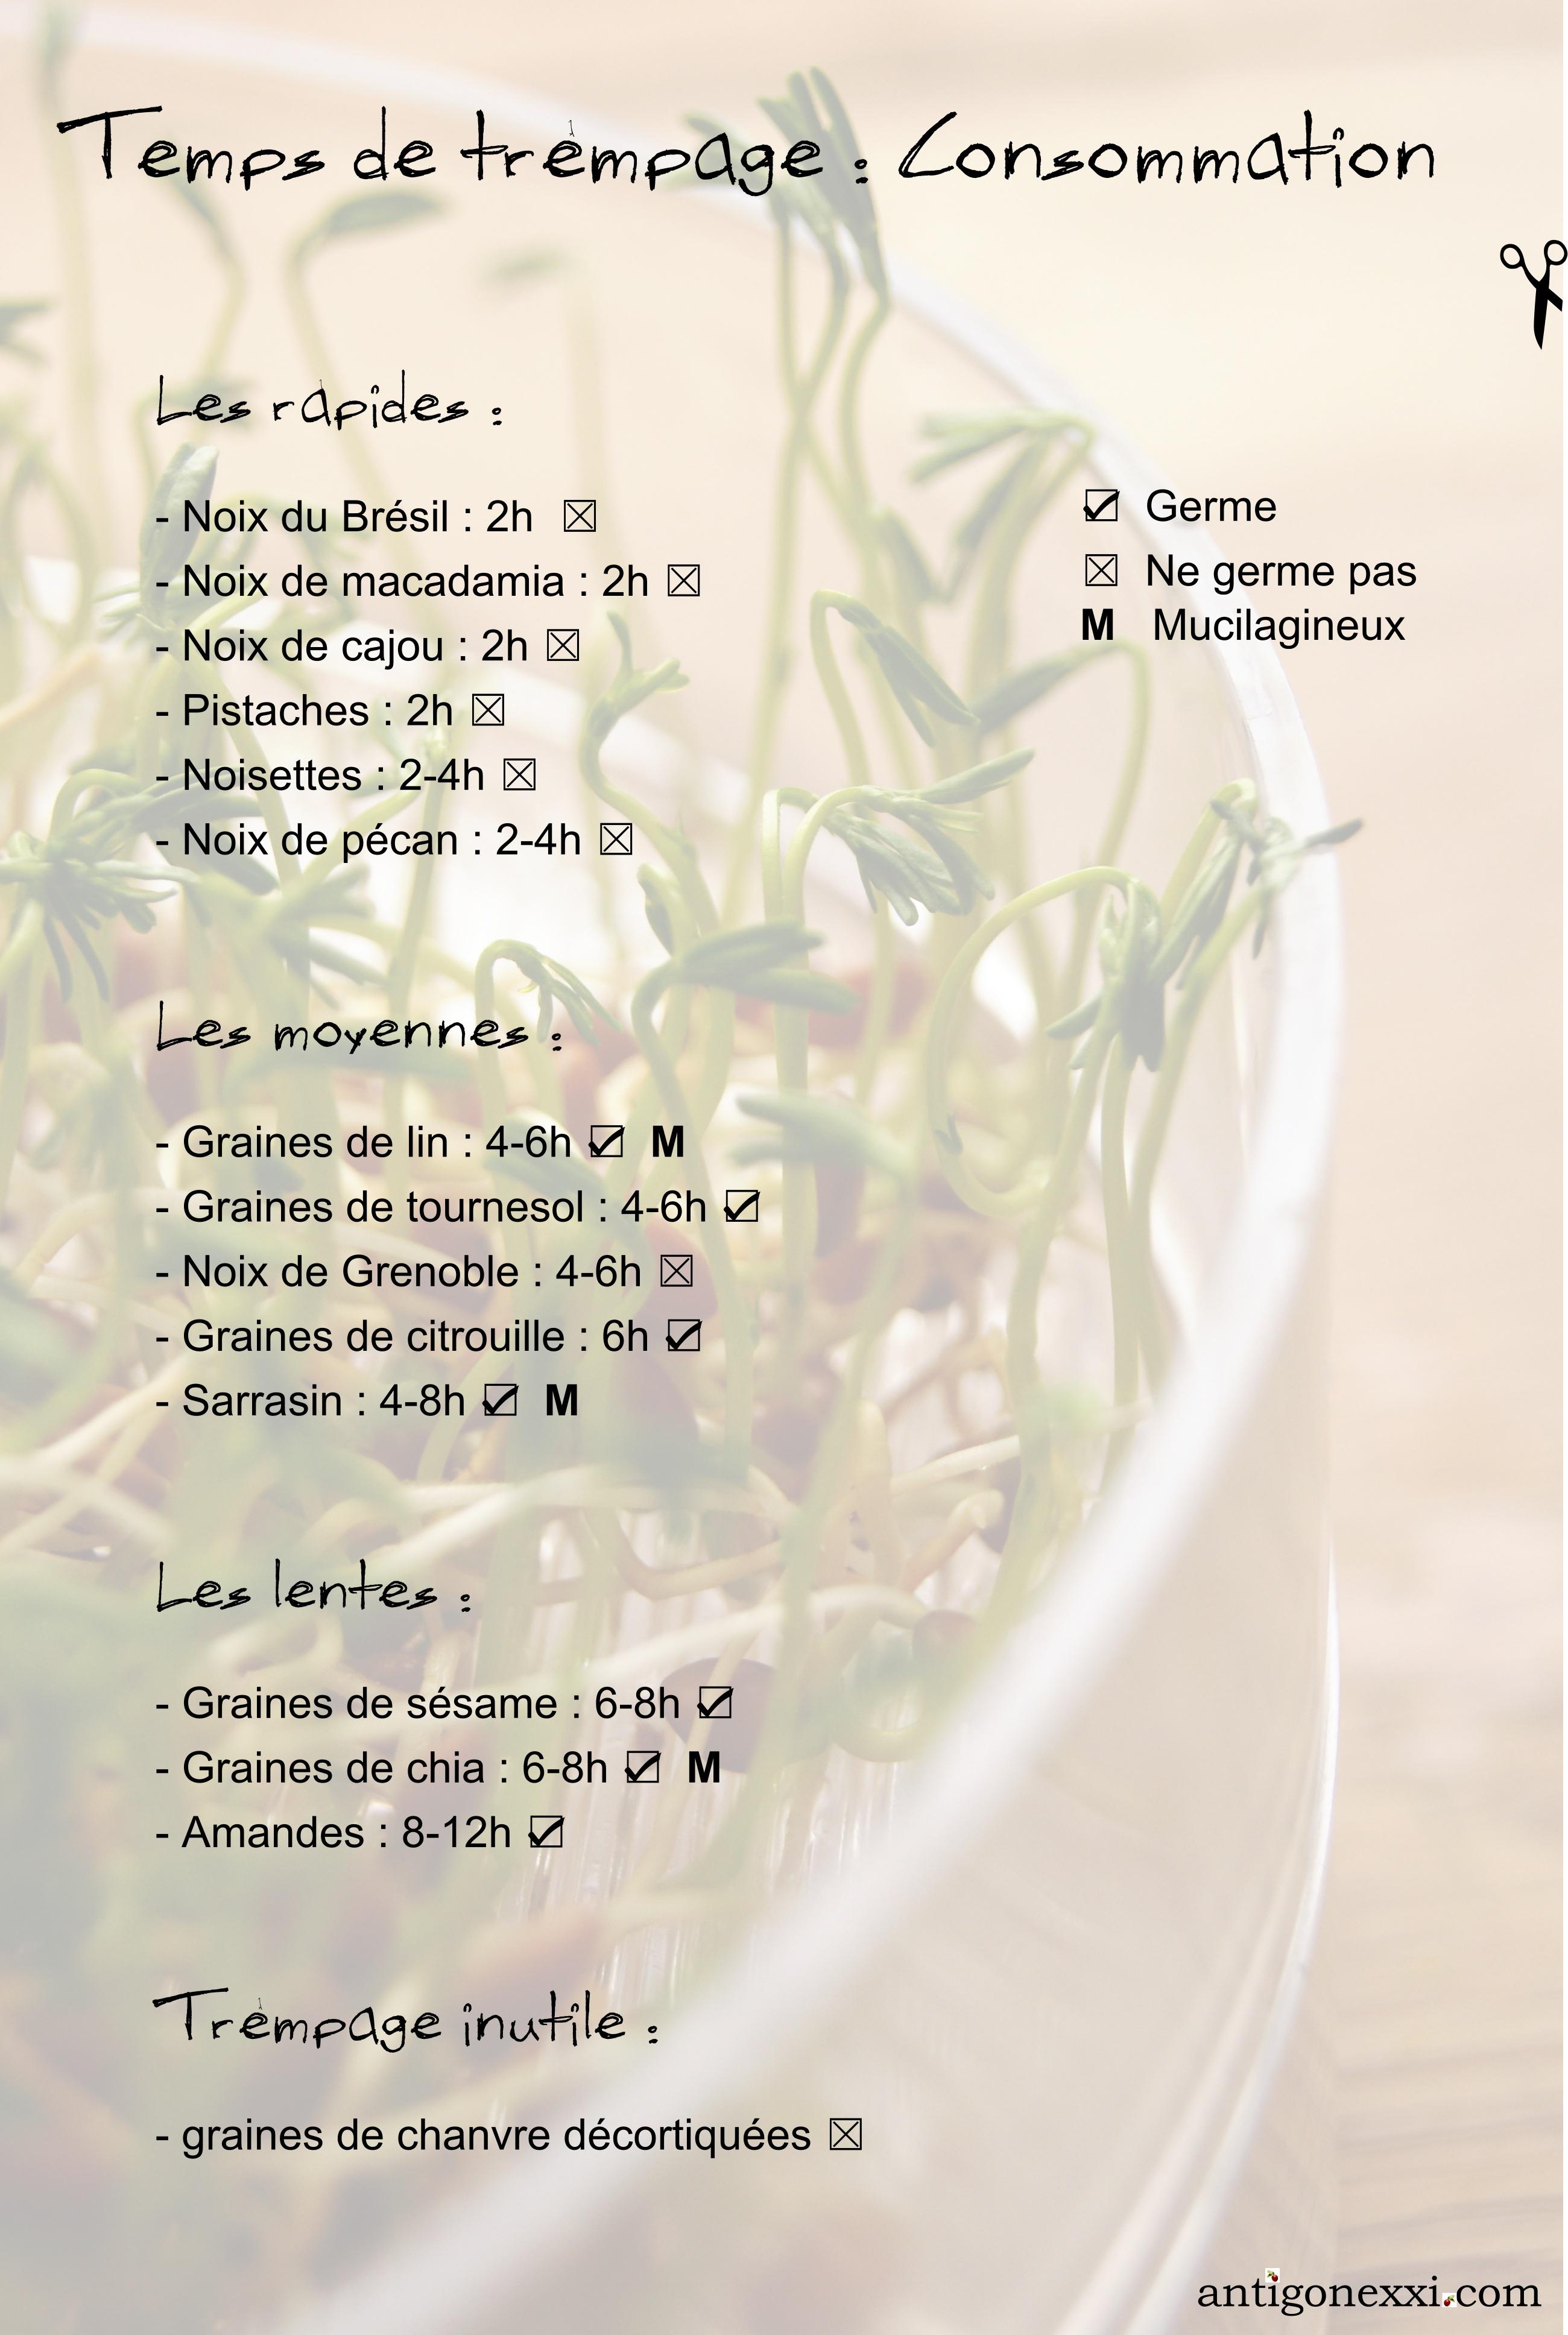 Graines germ es le b a ba antigone xxi for Temps de germination gazon